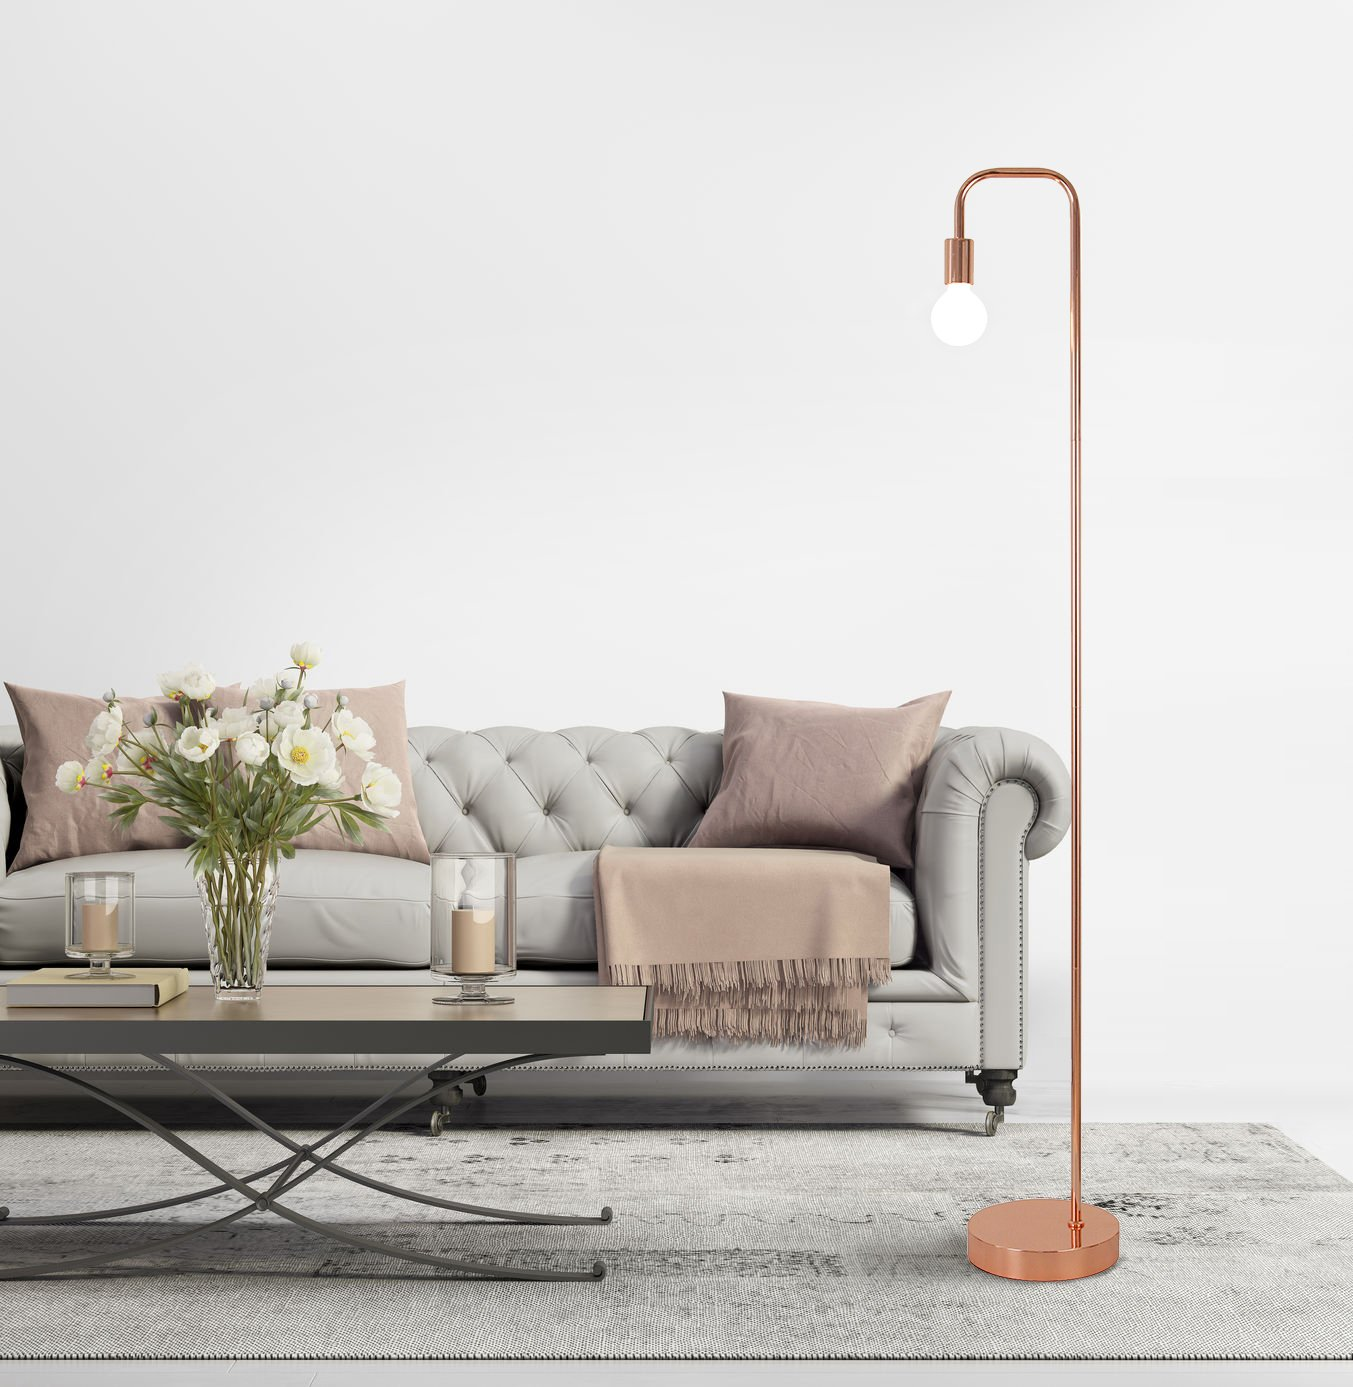 Floor Lamp for Living Room, Industrial Rose Gold Metal Reading Lamp ...